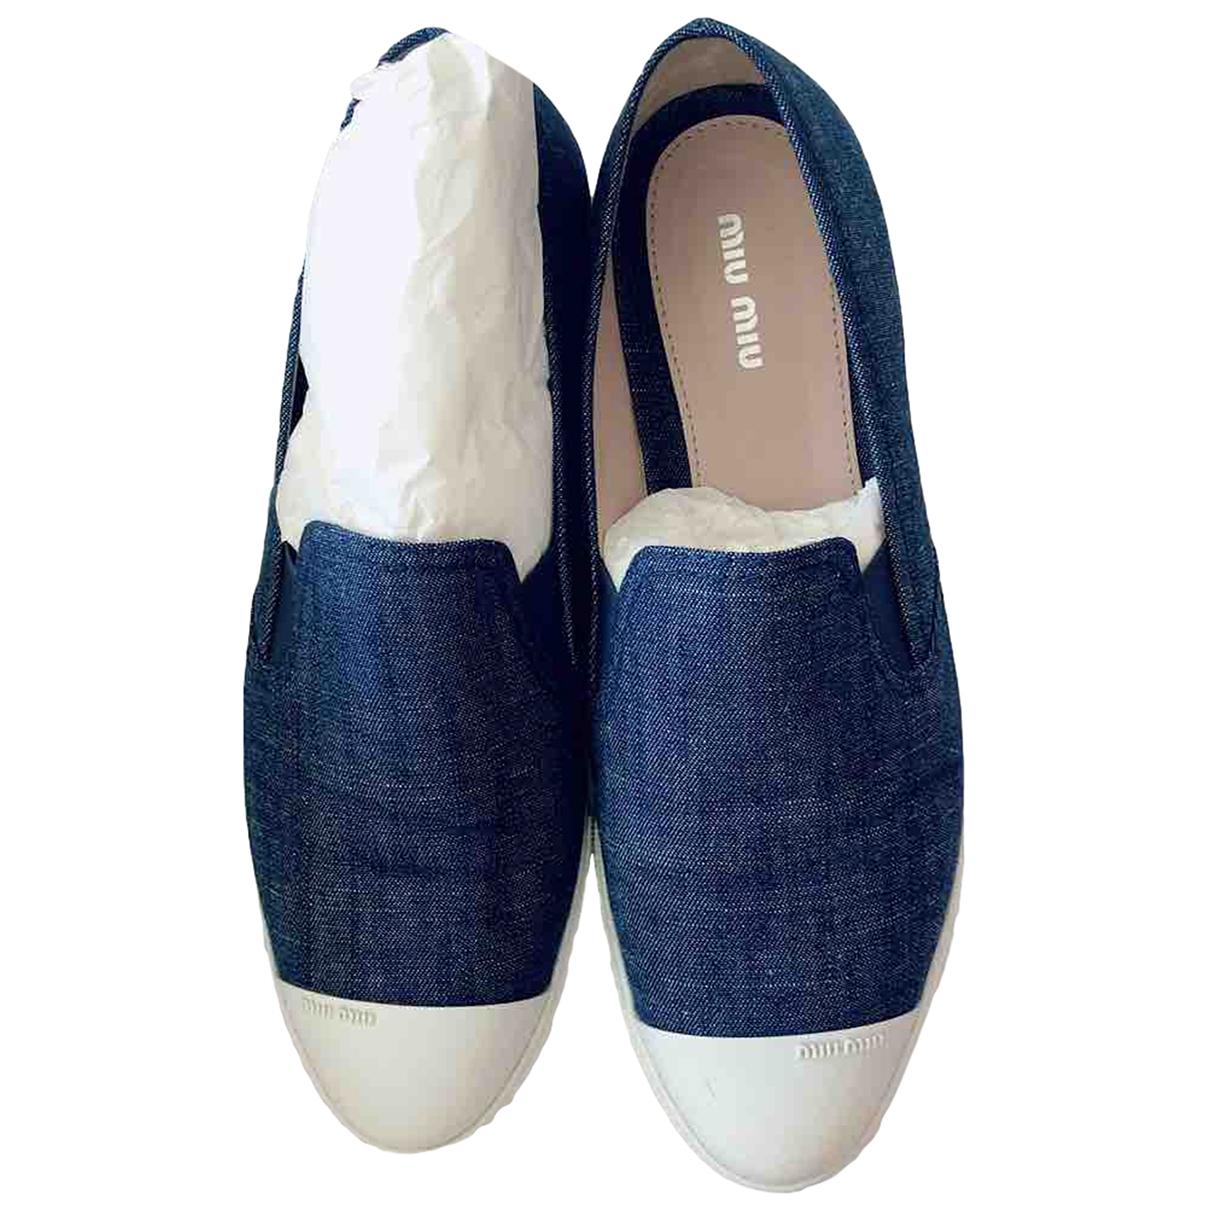 Miu Miu - Baskets   pour femme en toile - bleu